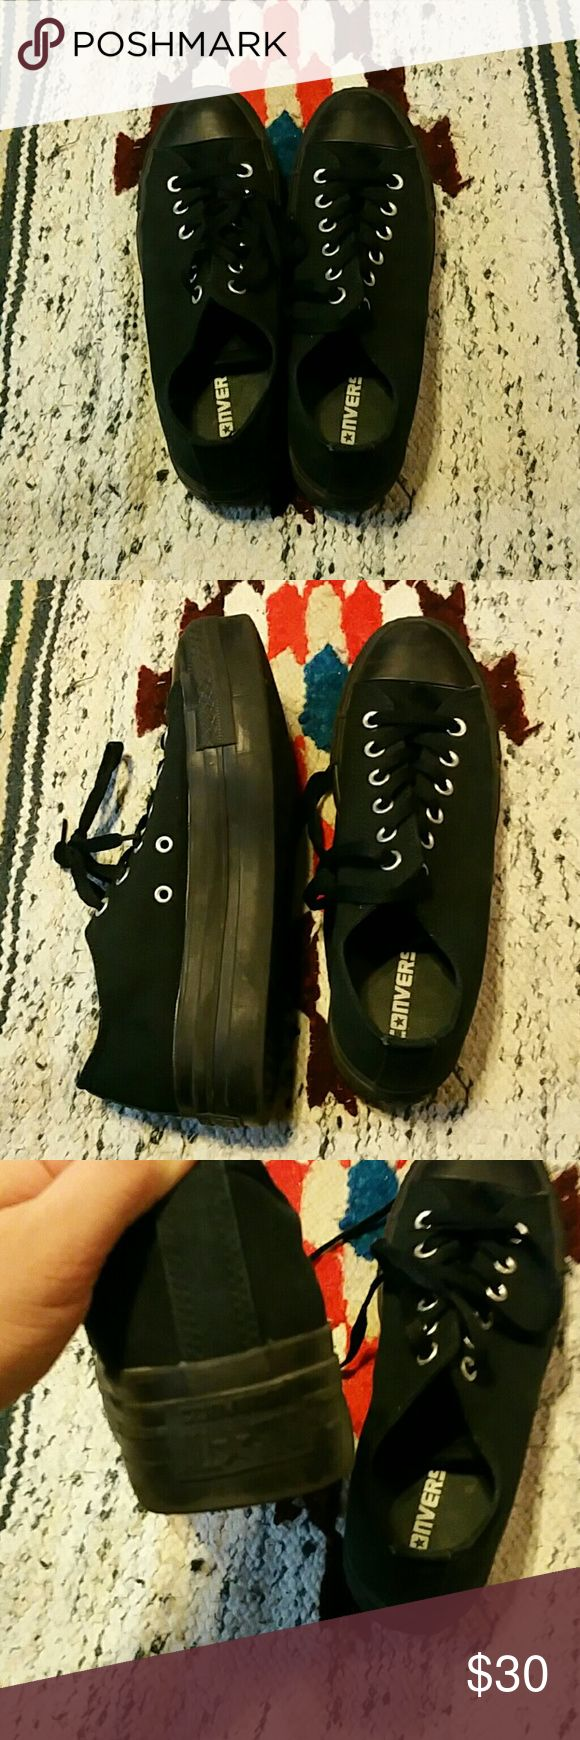 Platform converse Black platform converse in great condition Converse Shoes Platforms